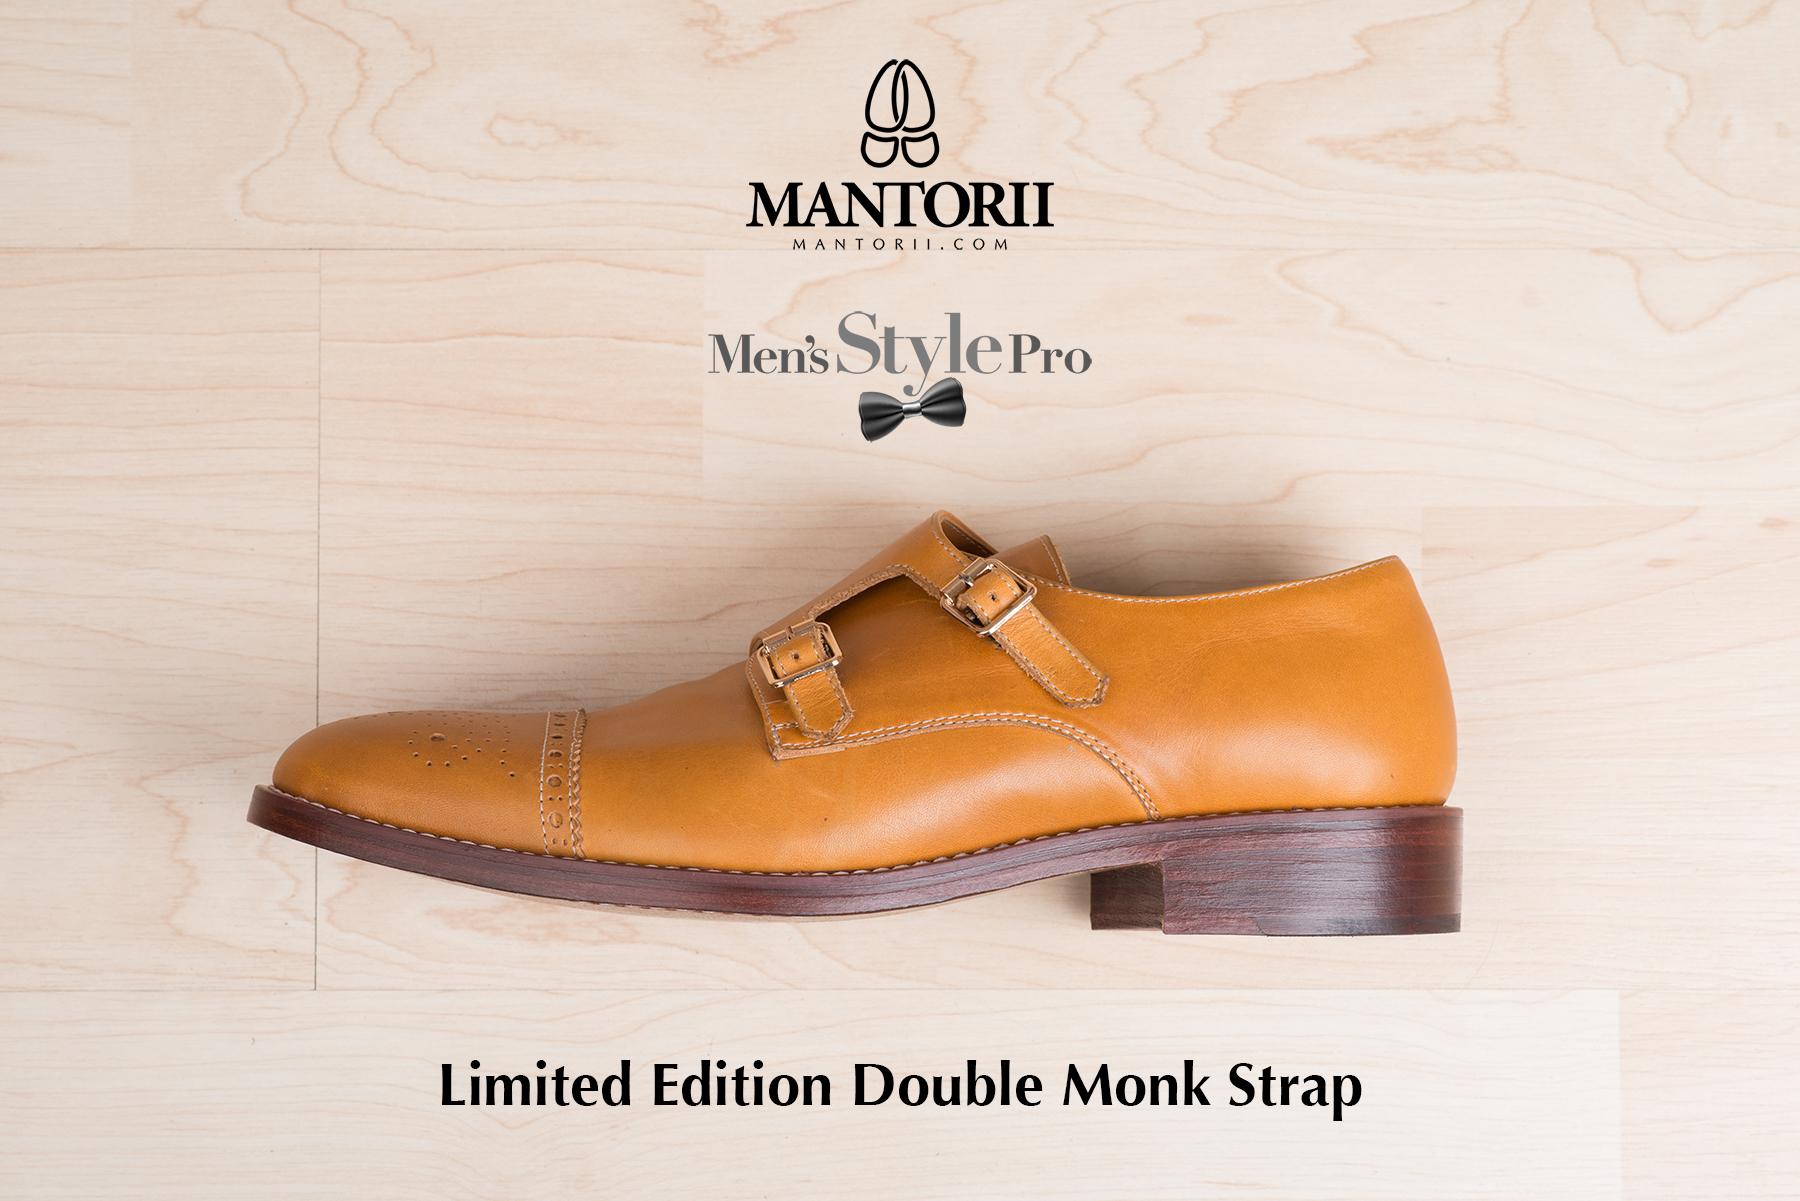 The Men's Style Pro x Mantorii Custom